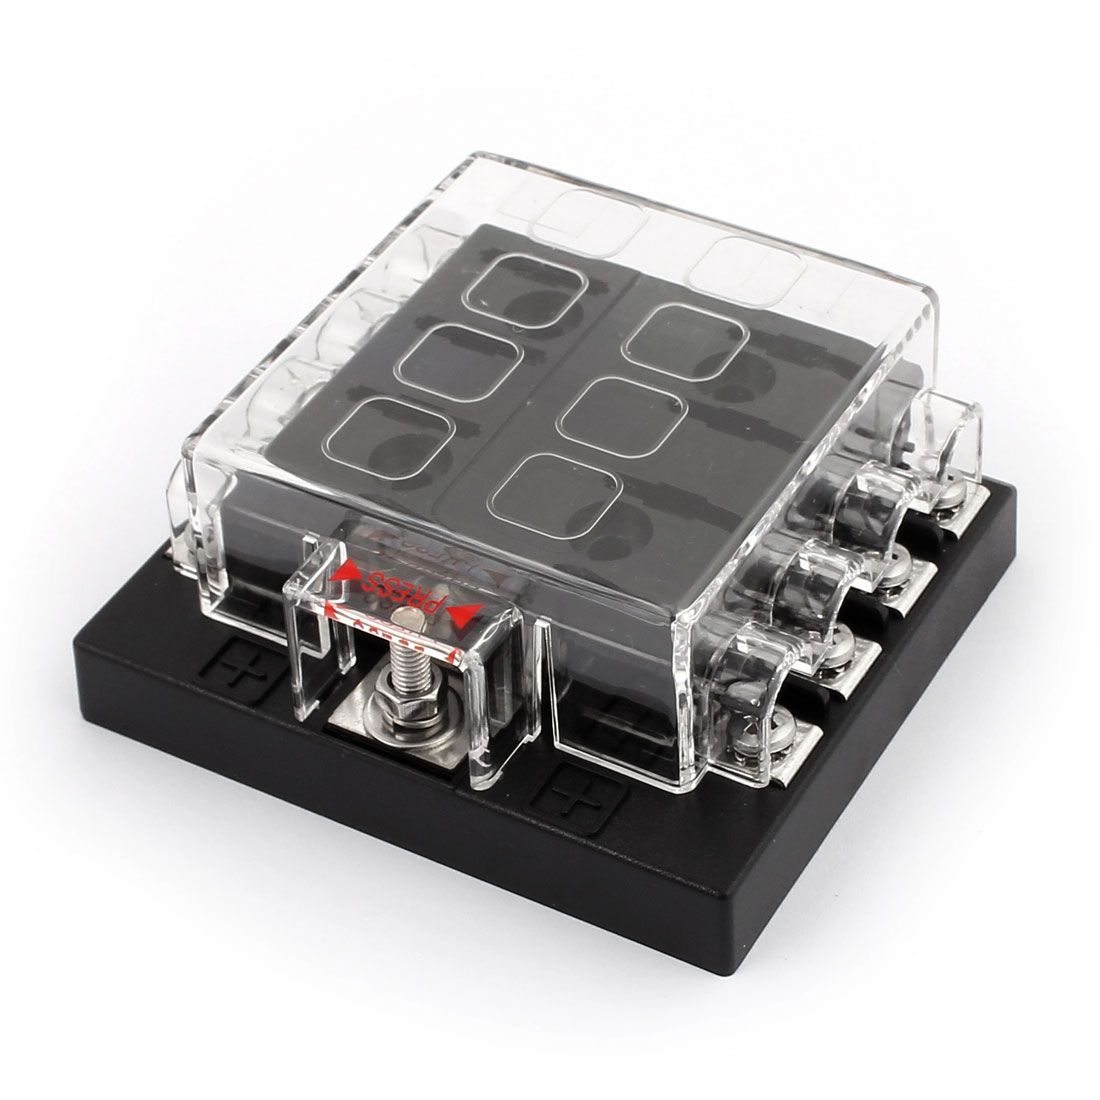 hight resolution of 8 fuse block holder box wiring diagram dat 8 fuse block holder box